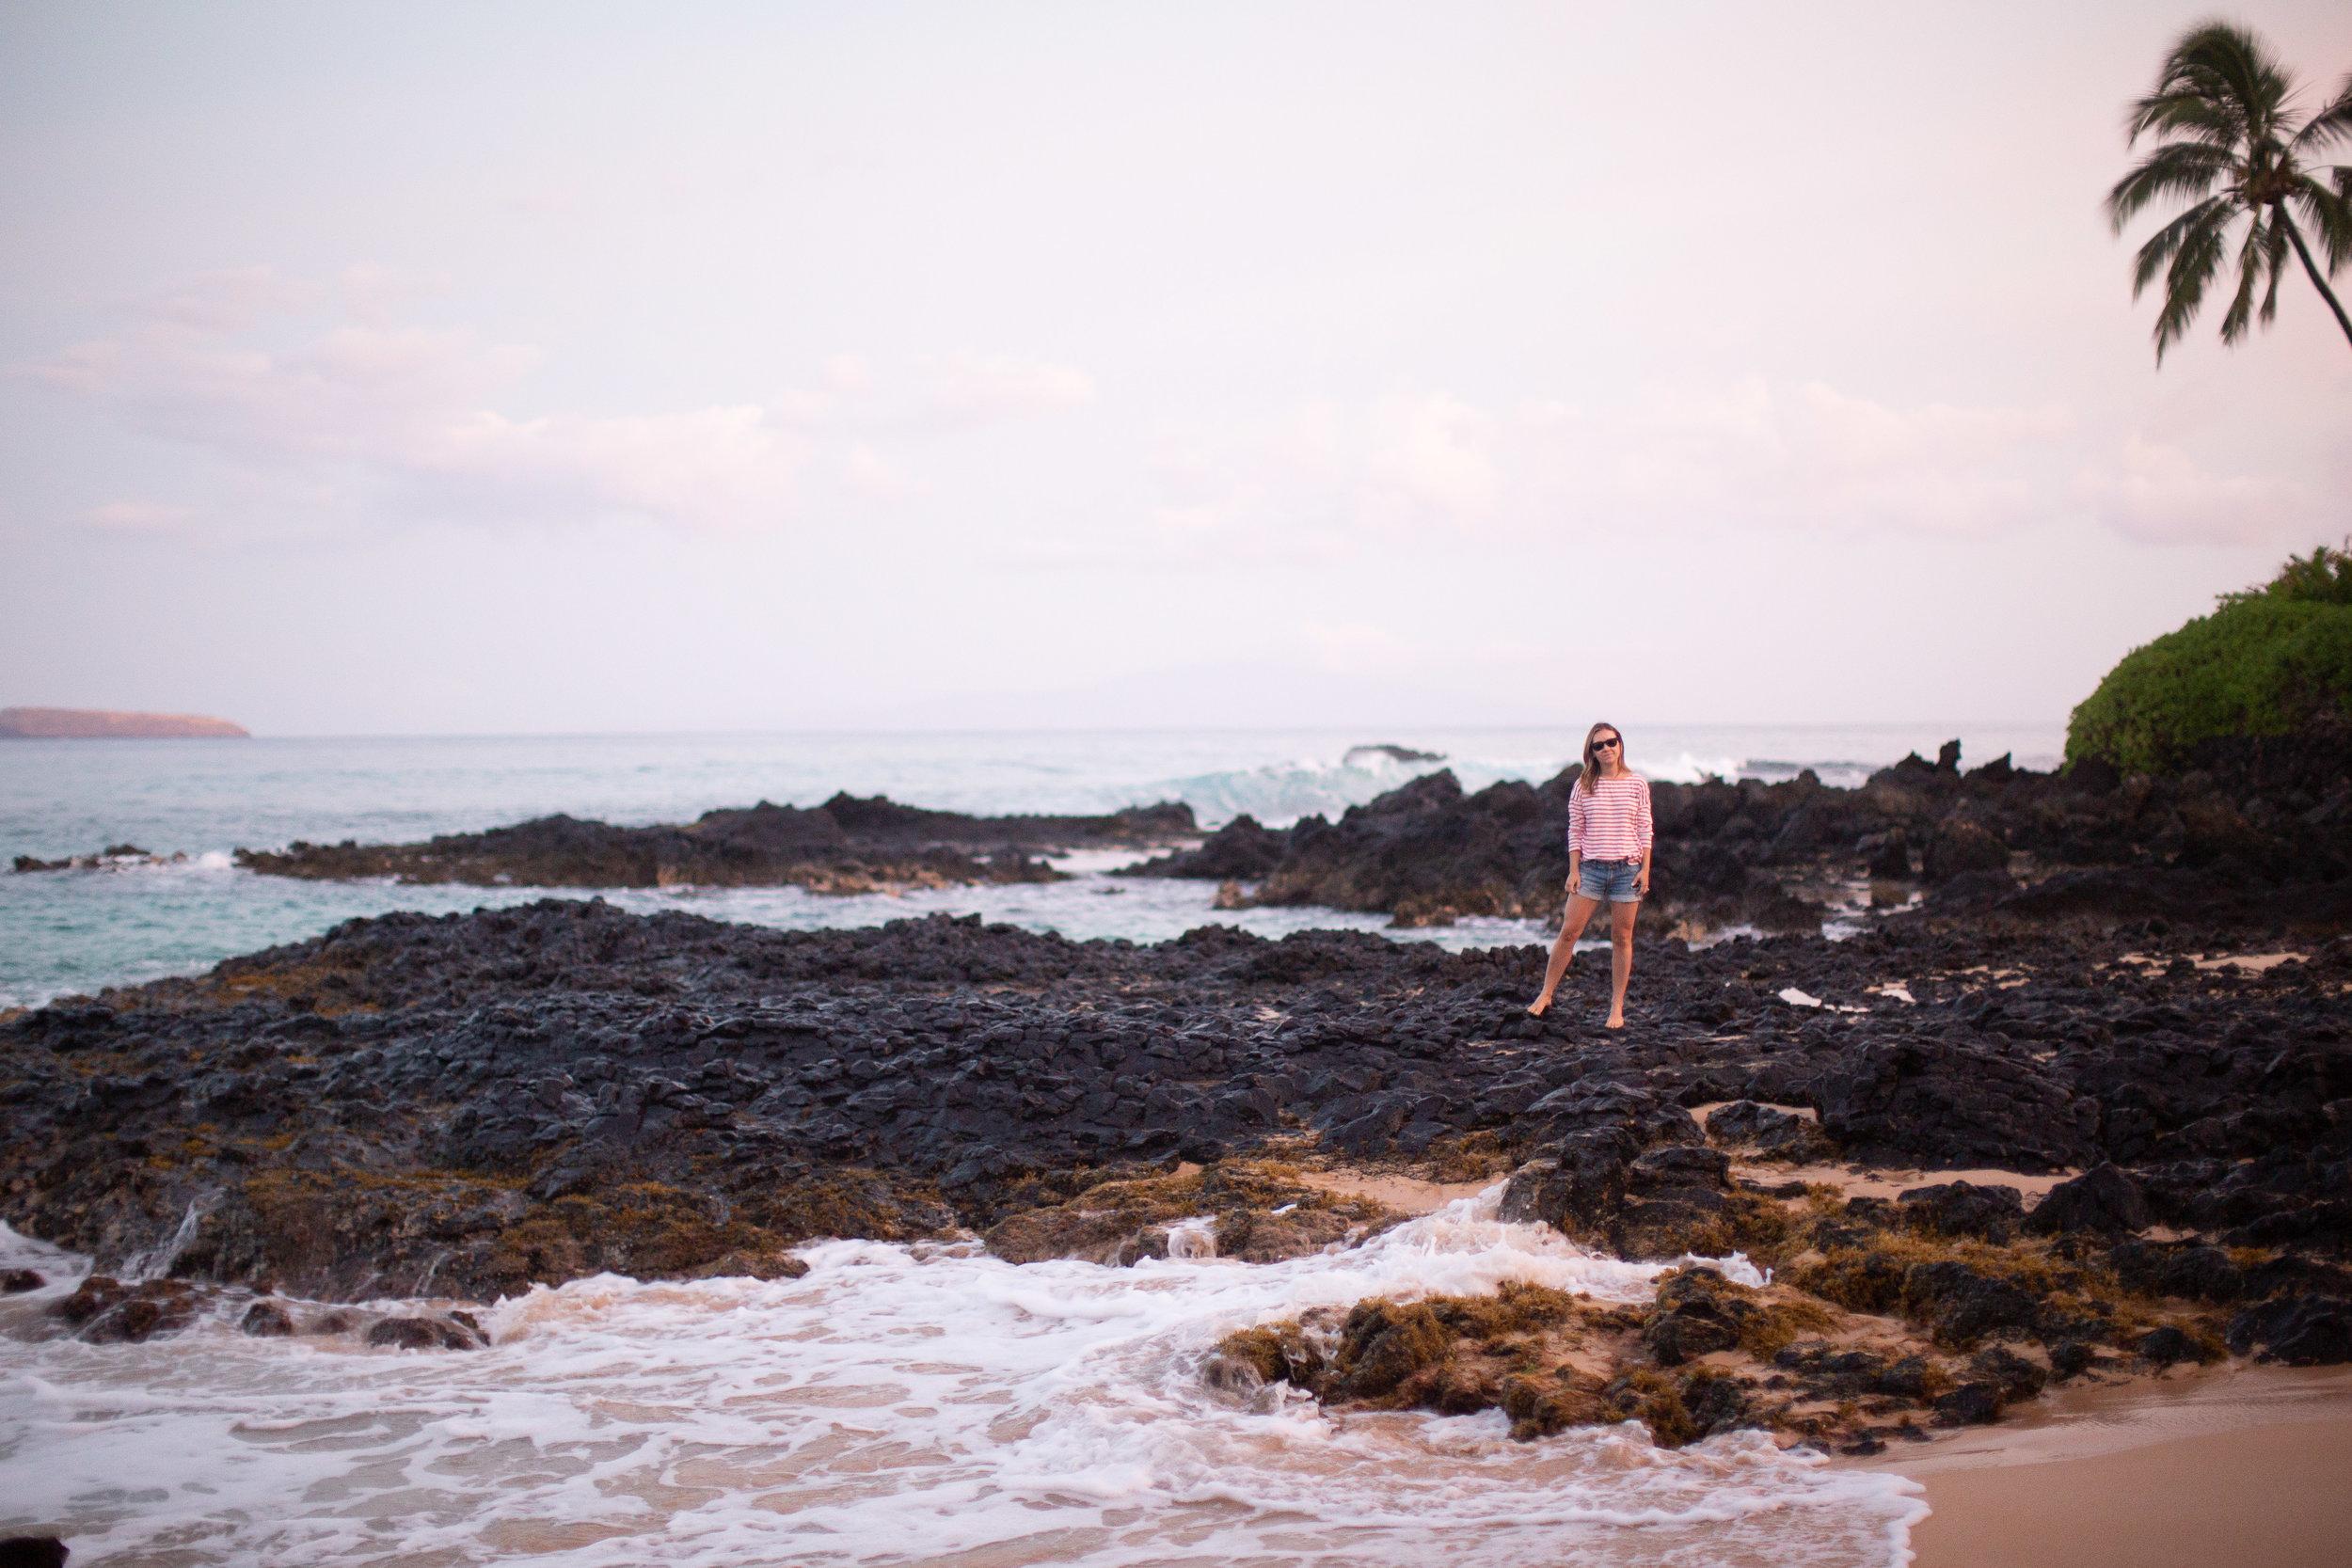 fizz-fade-hawaii-sunrise-stripes2-32.jpg